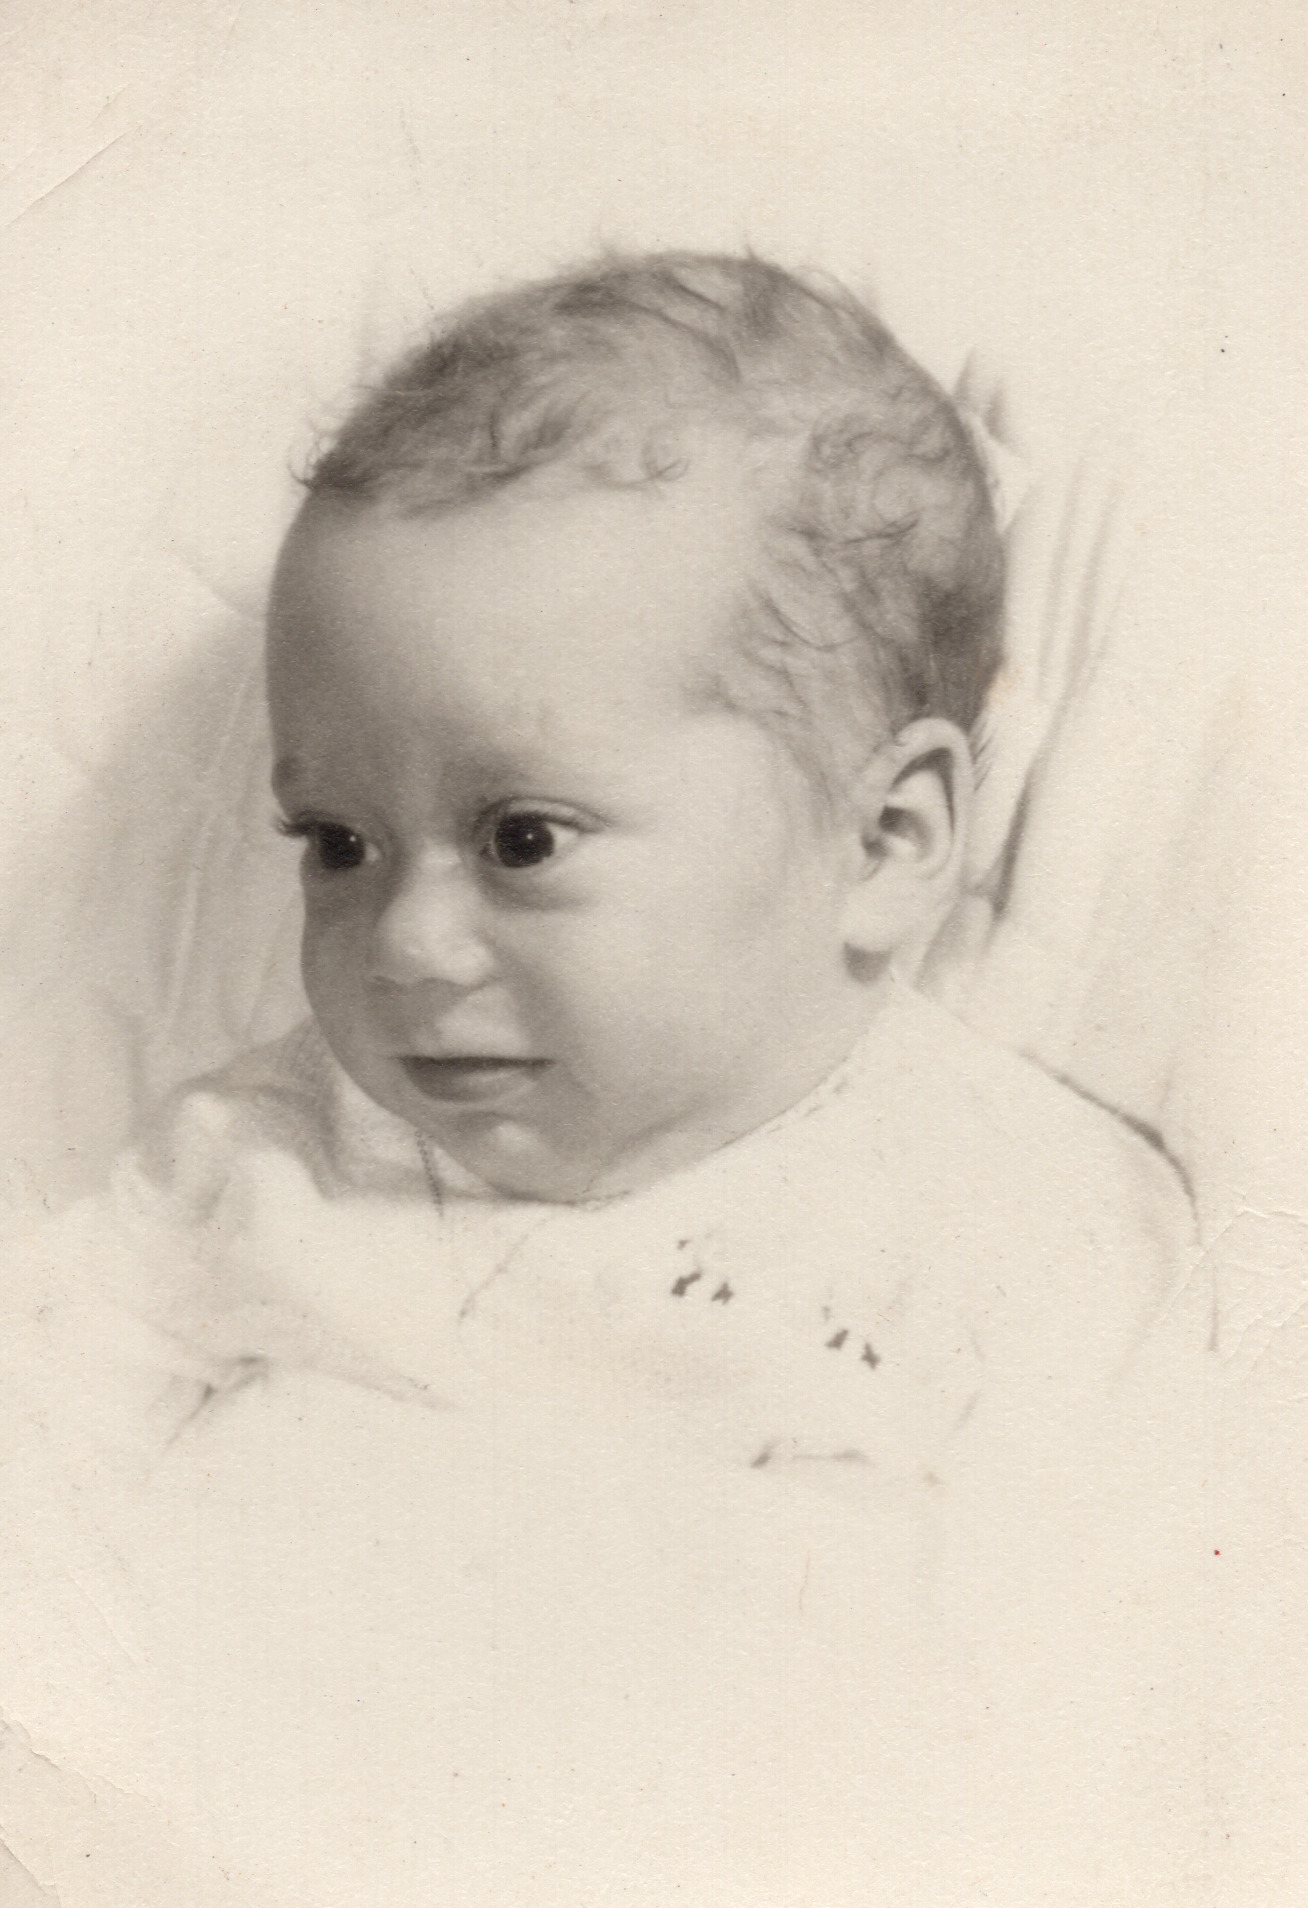 Buddy - 1956